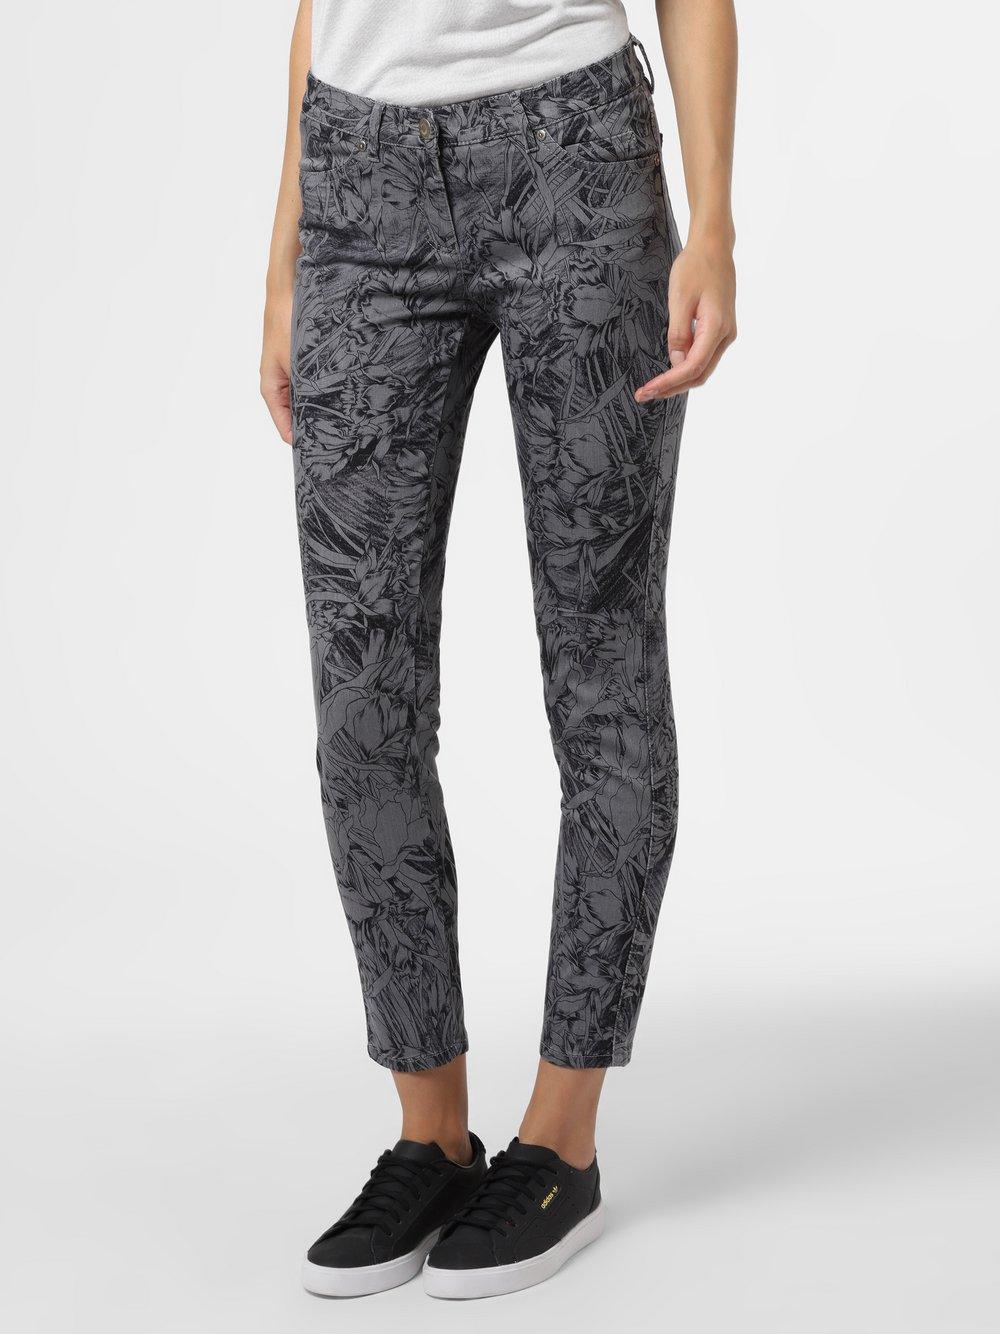 TONI – Spodnie damskie – Perfect Shape Skinny, szary Van Graaf 483319-0001-00460